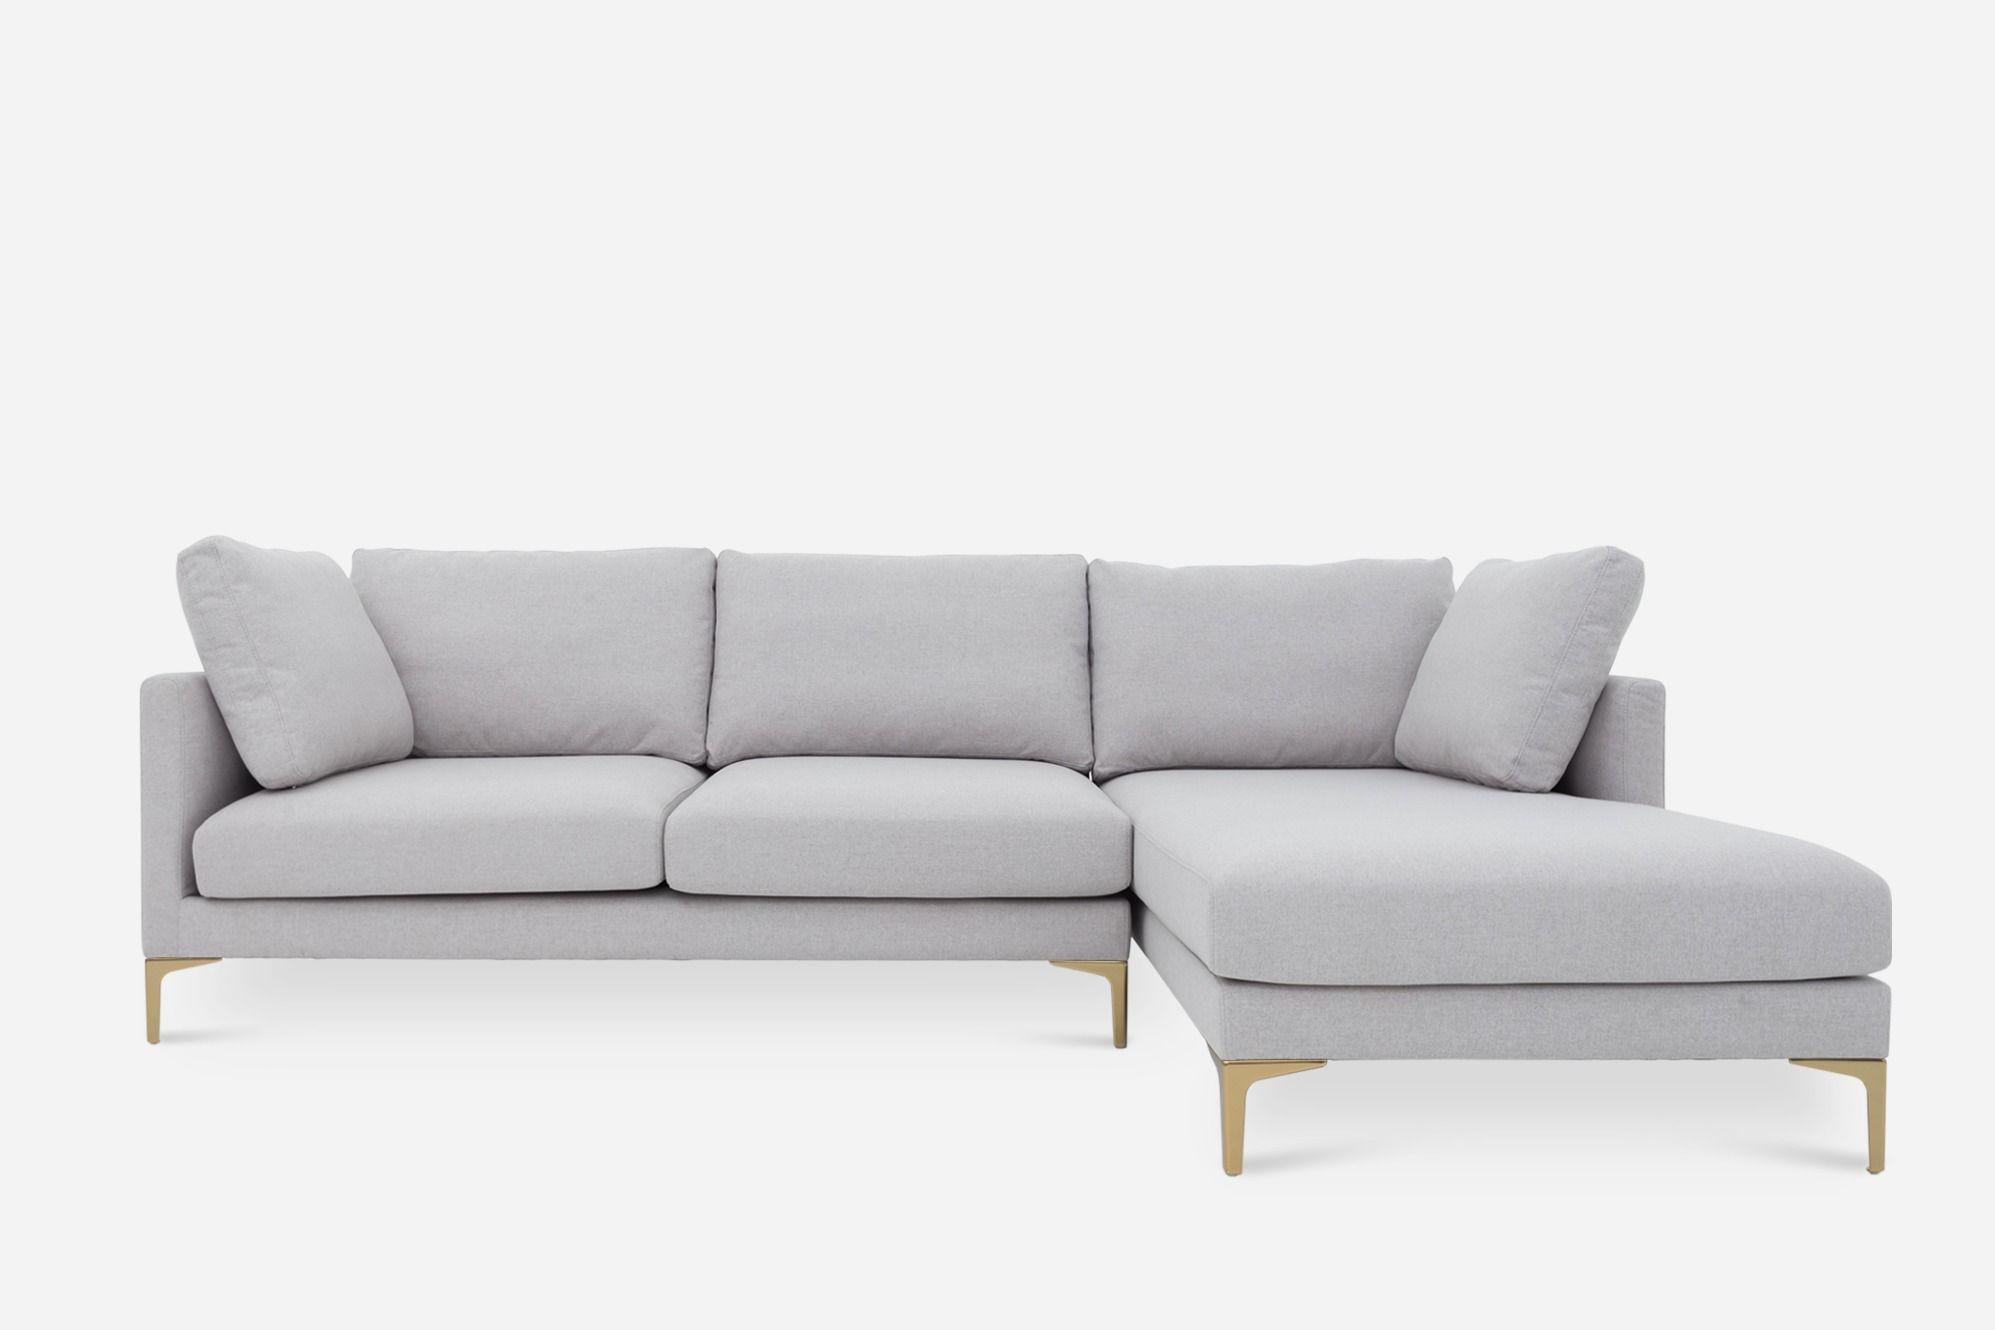 adams chaise sectional sofa deco sofa sectional sofa classic rh pinterest com